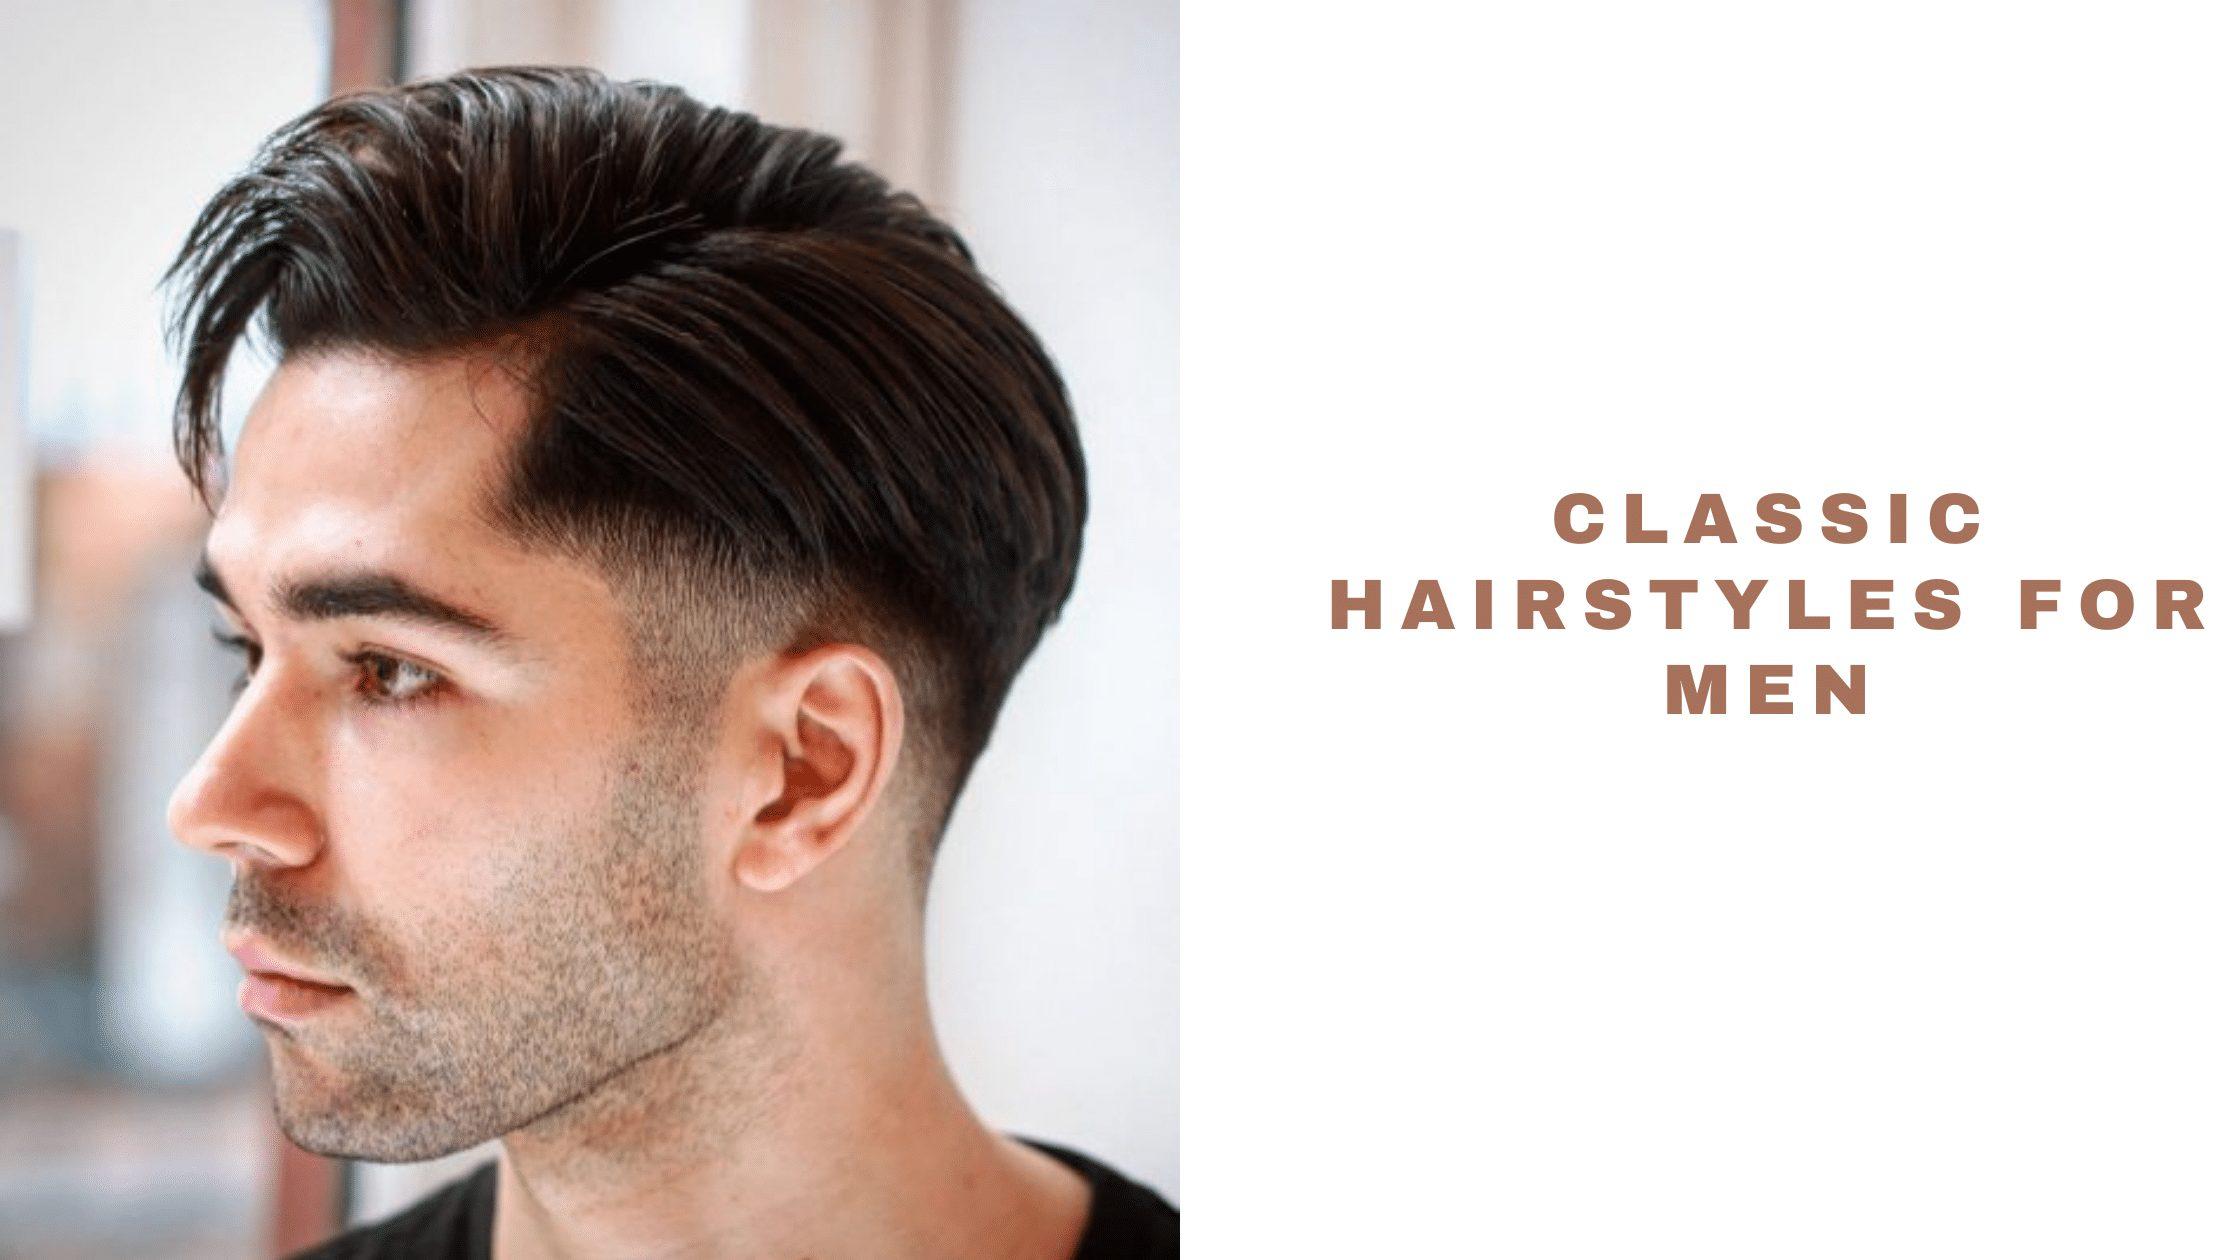 30 Classic Men's Hairstyles 2021